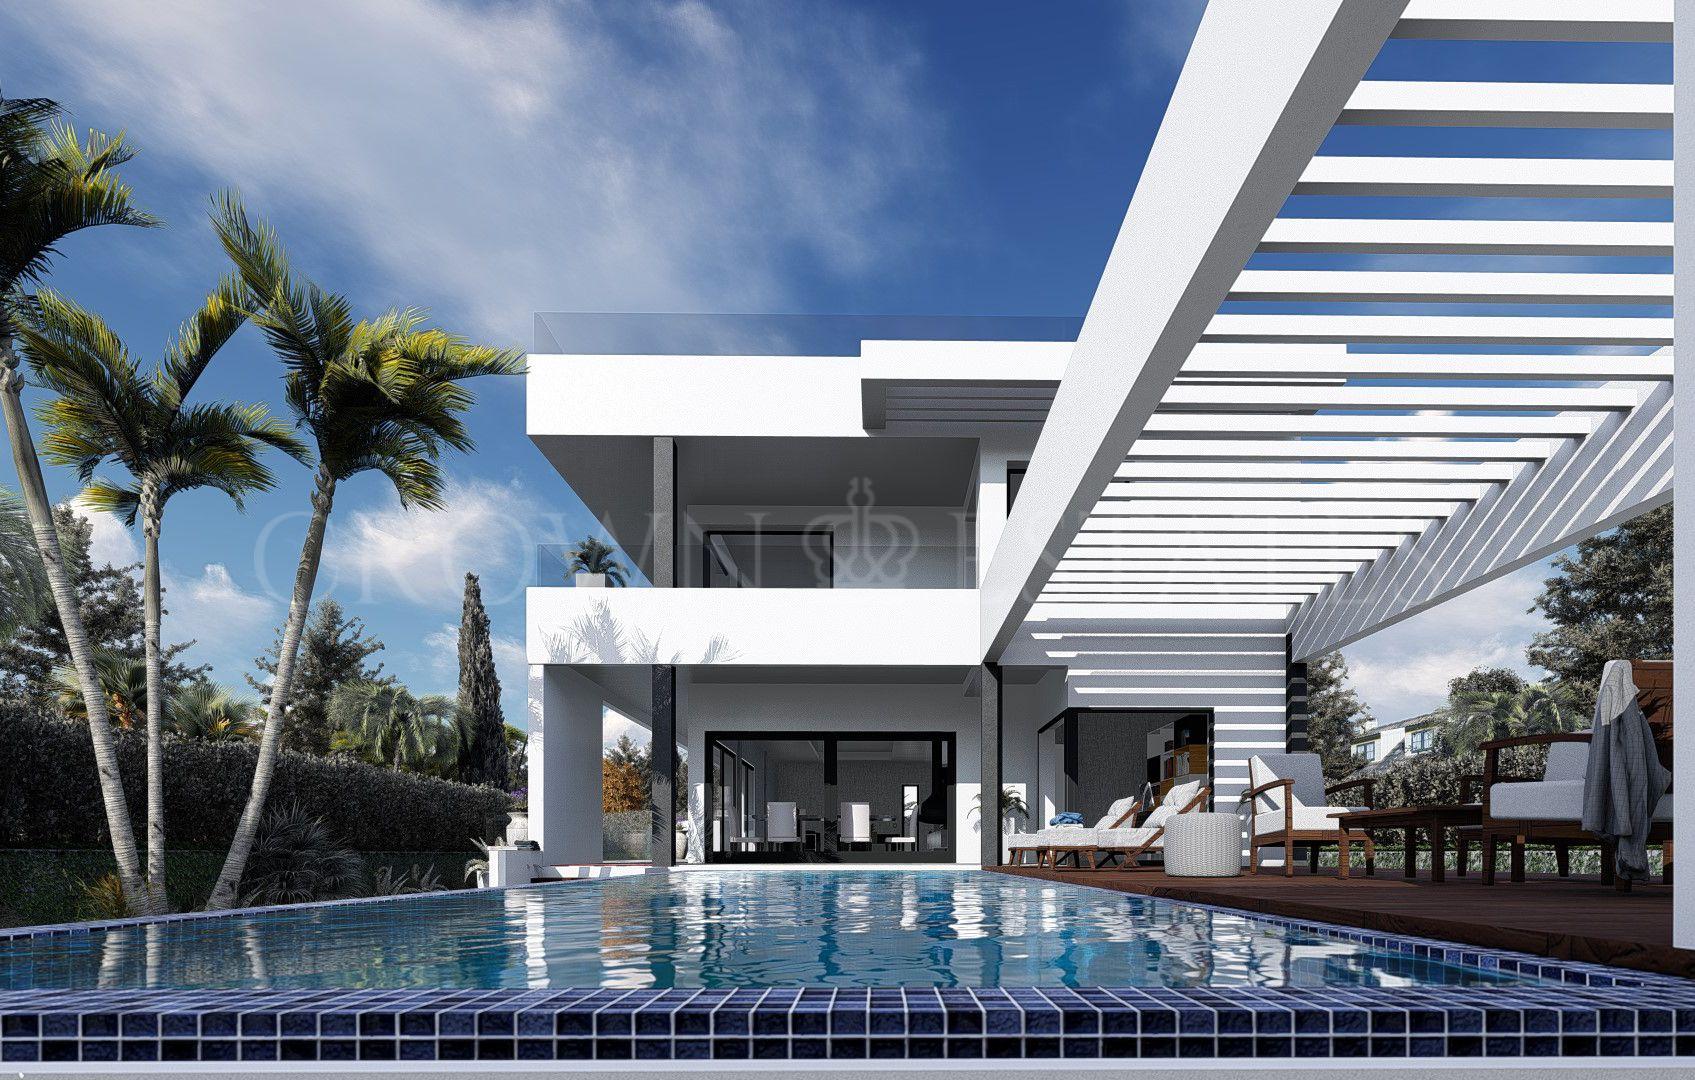 Luxurious new brand villa just 300 meters from the beach in Puerto Marina, Benalmadena